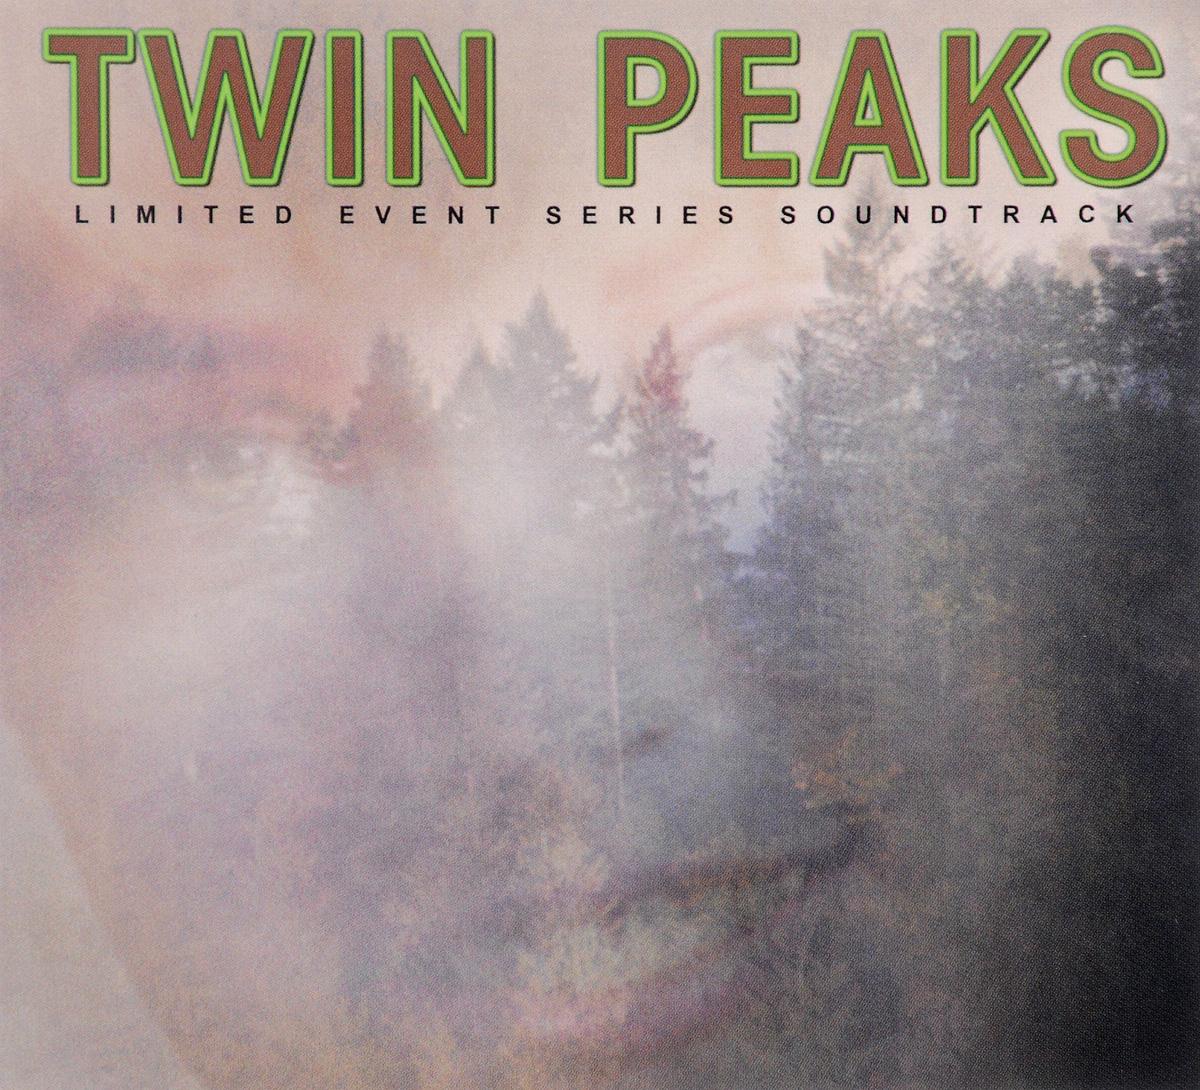 лучшая цена Twin Peaks. Limited Event Series Soundtrack